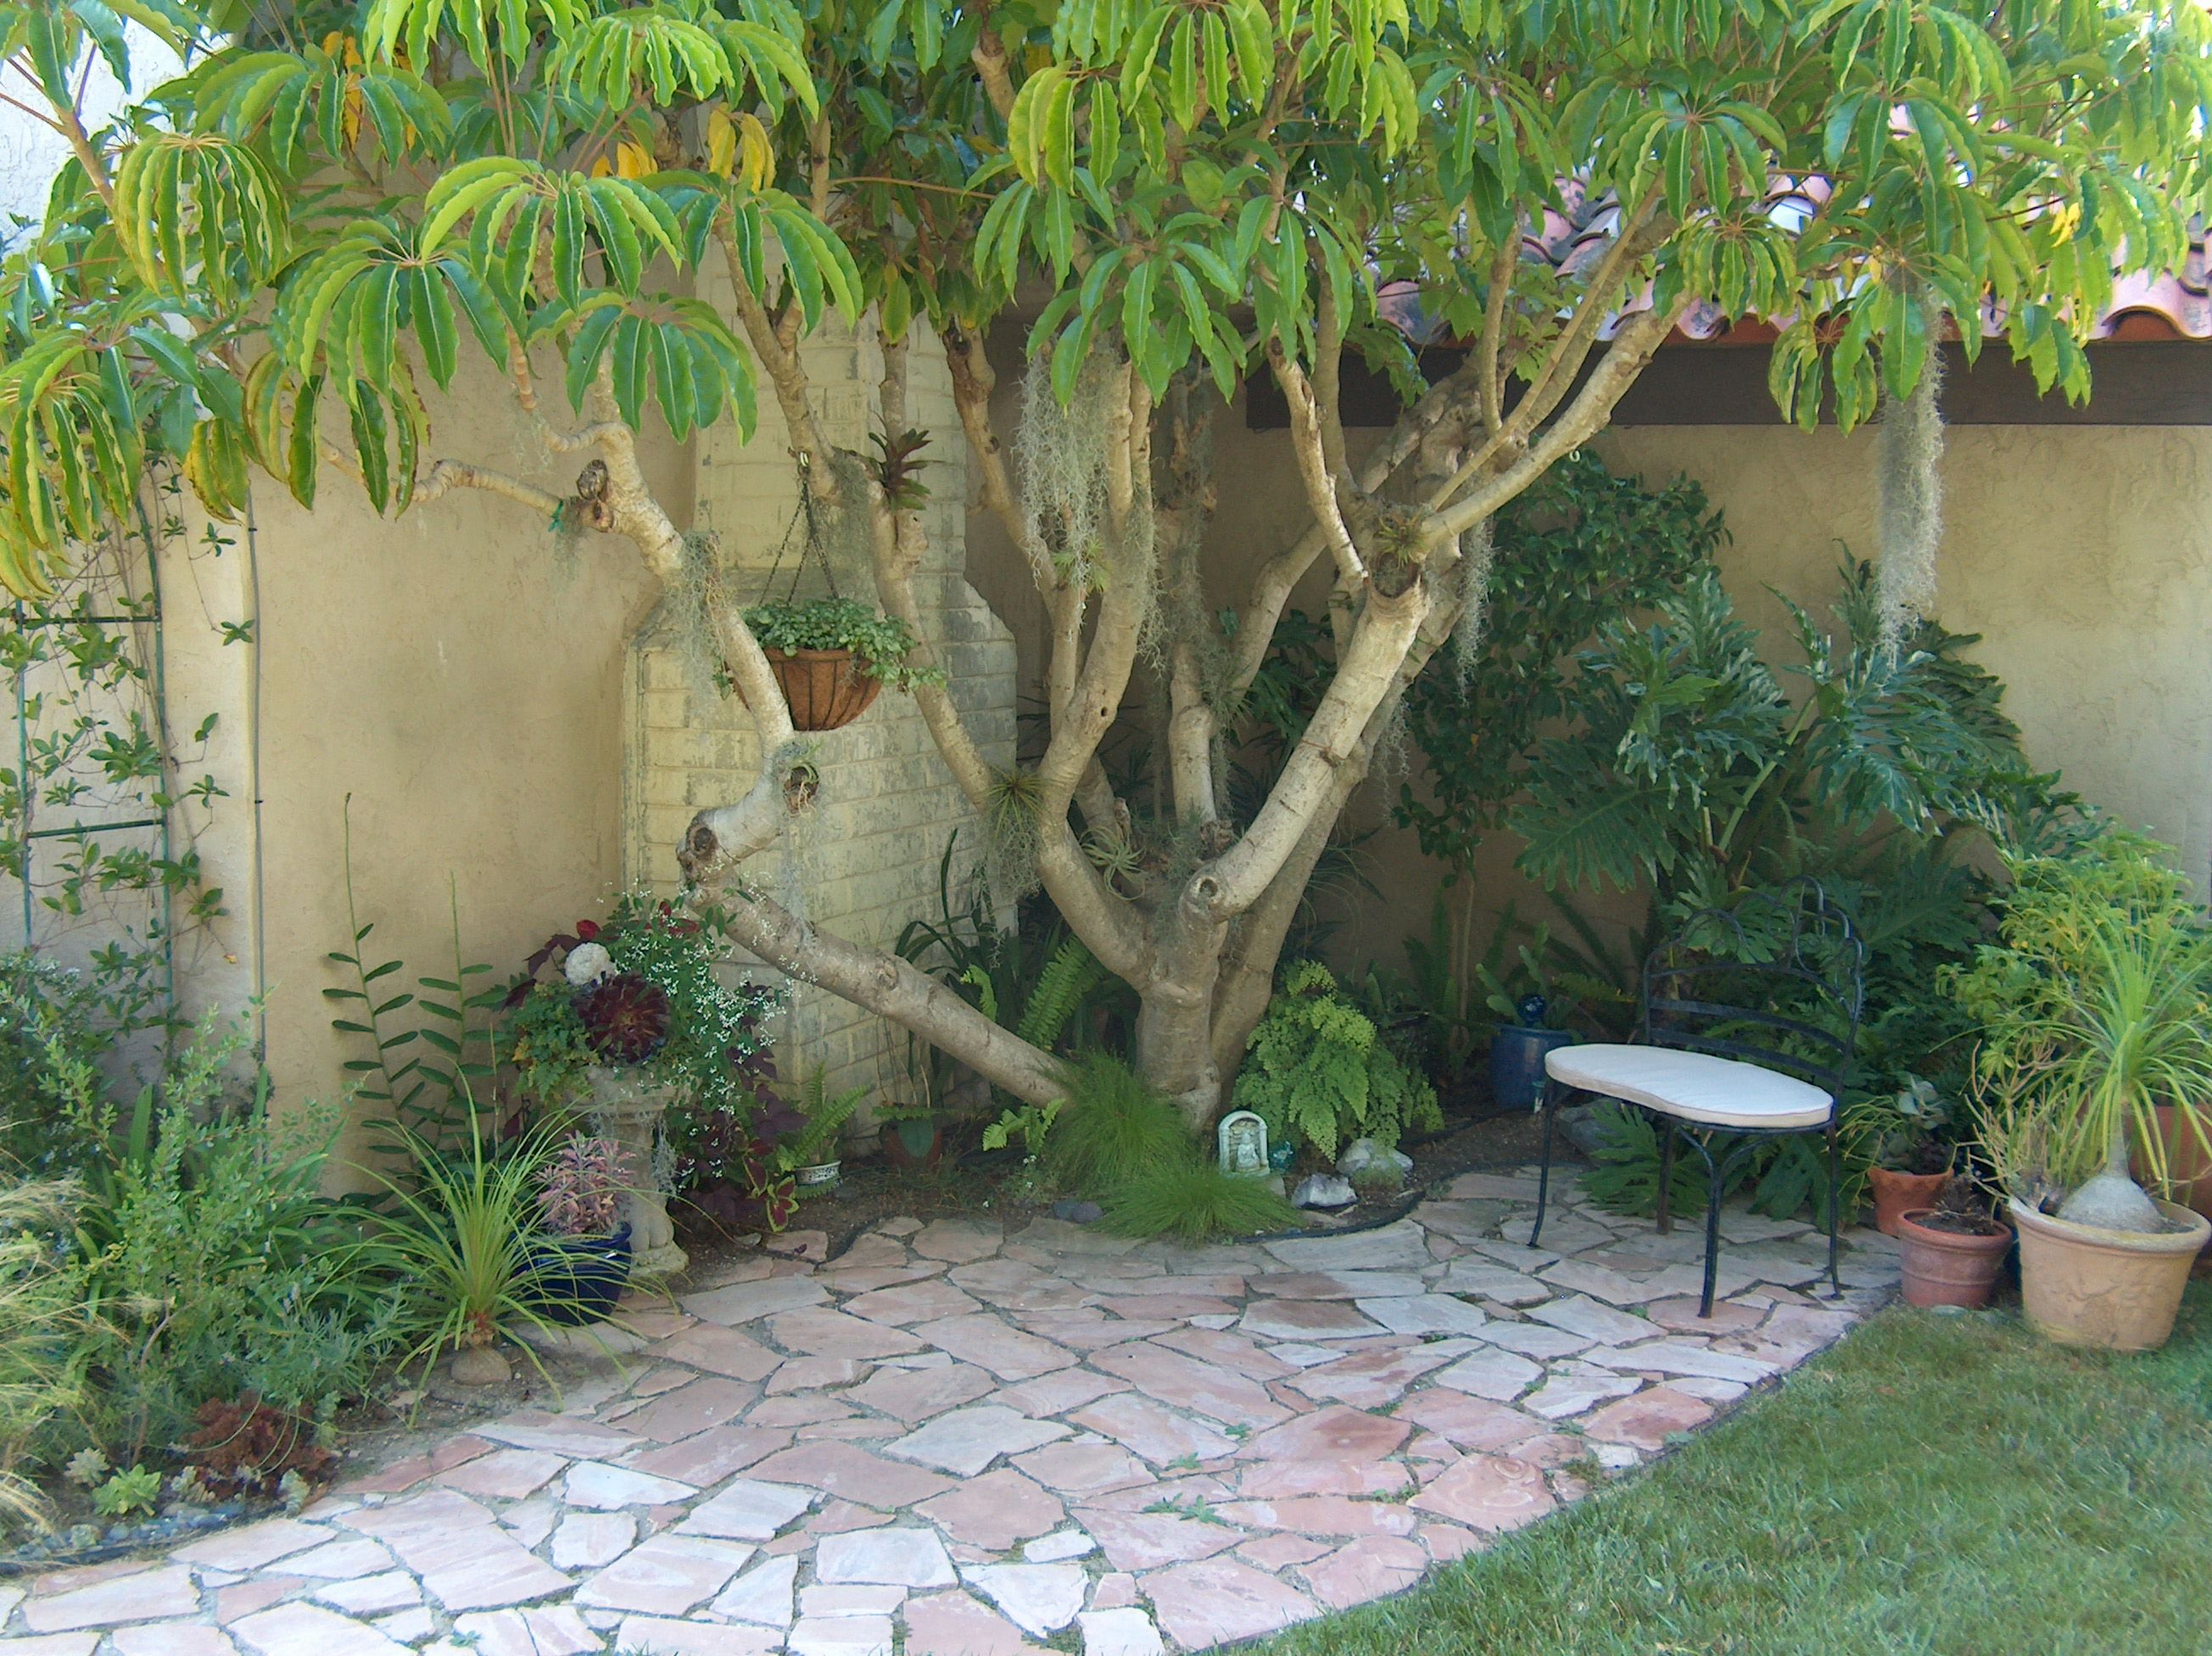 Beau 1000+ Images About Meditation Sanctuary On Pinterest | Meditation Chair,  Meditation Corner And Meditation Garden